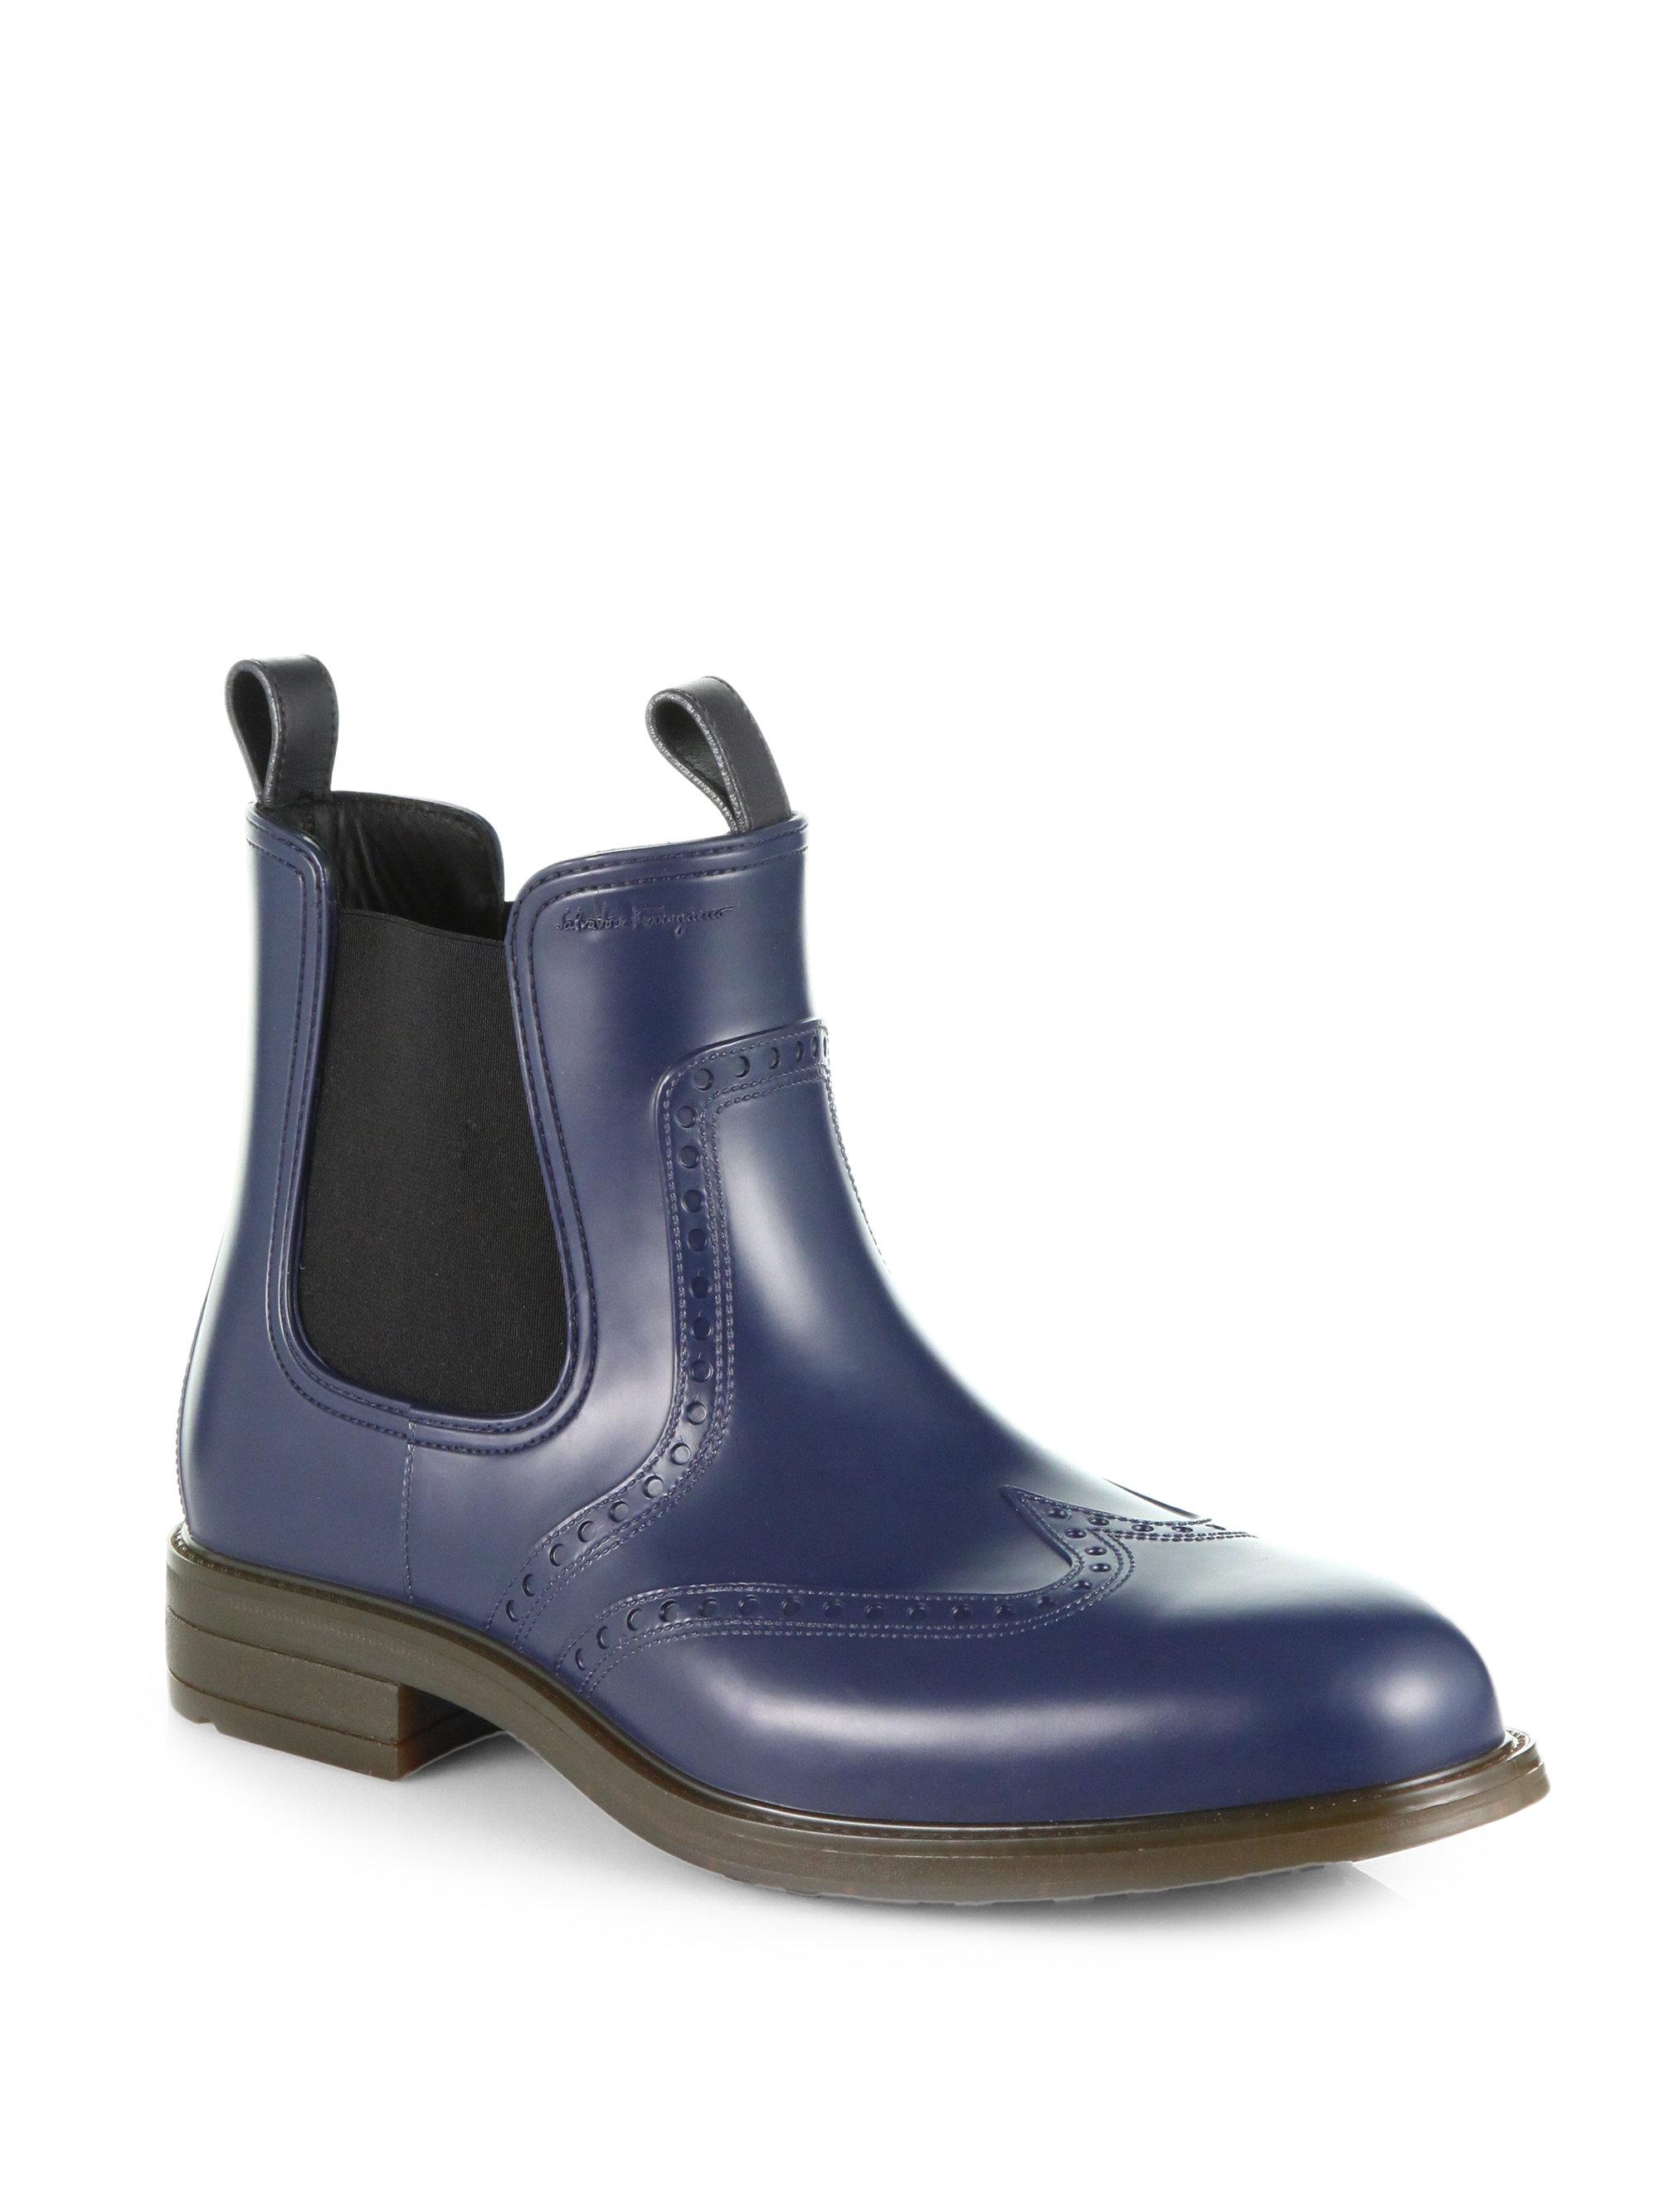 Lyst Ferragamo Boston Brogue Chelsea Rain Boots In Blue